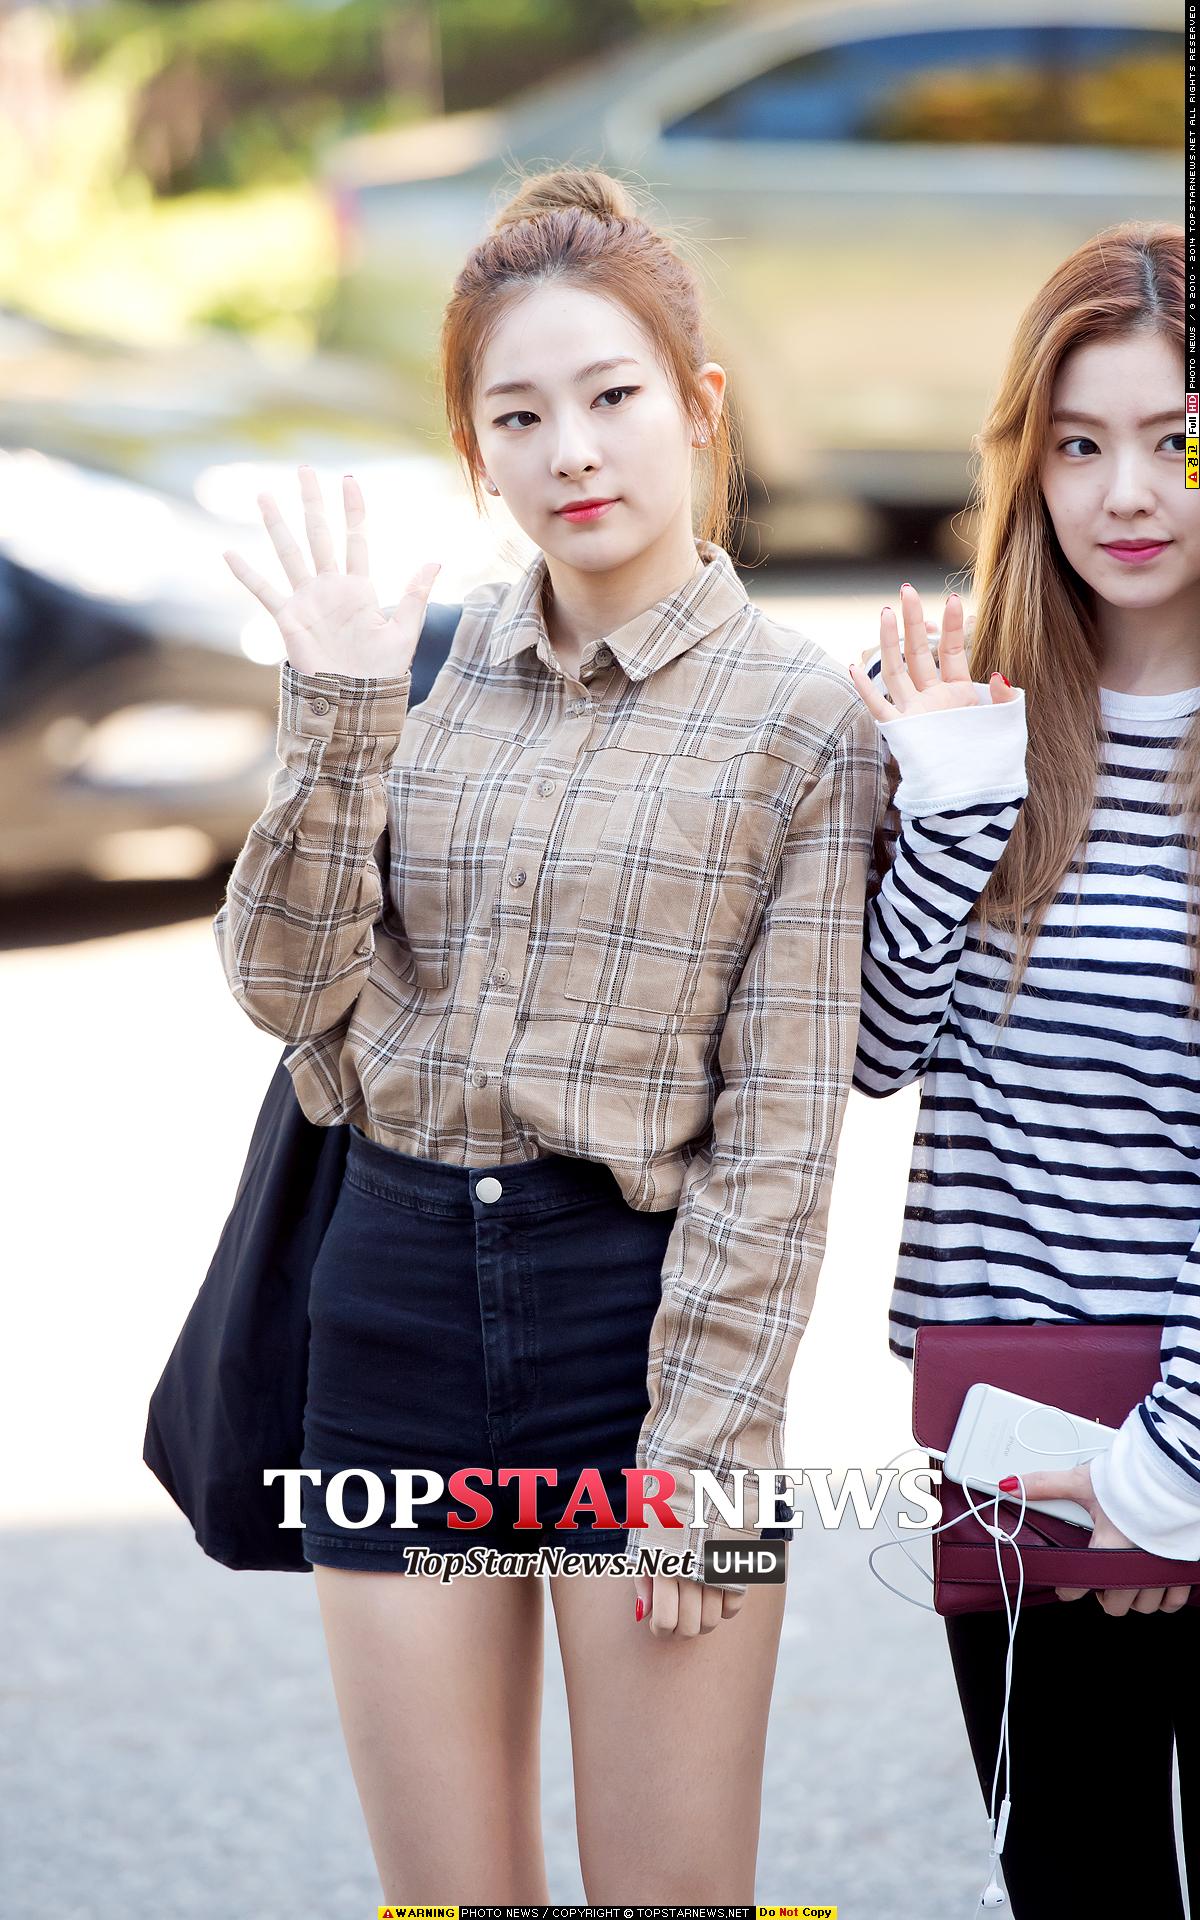 Seulgi將富有秋天色彩的格紋襯衫搭配高腰短褲,打造復古氣息。